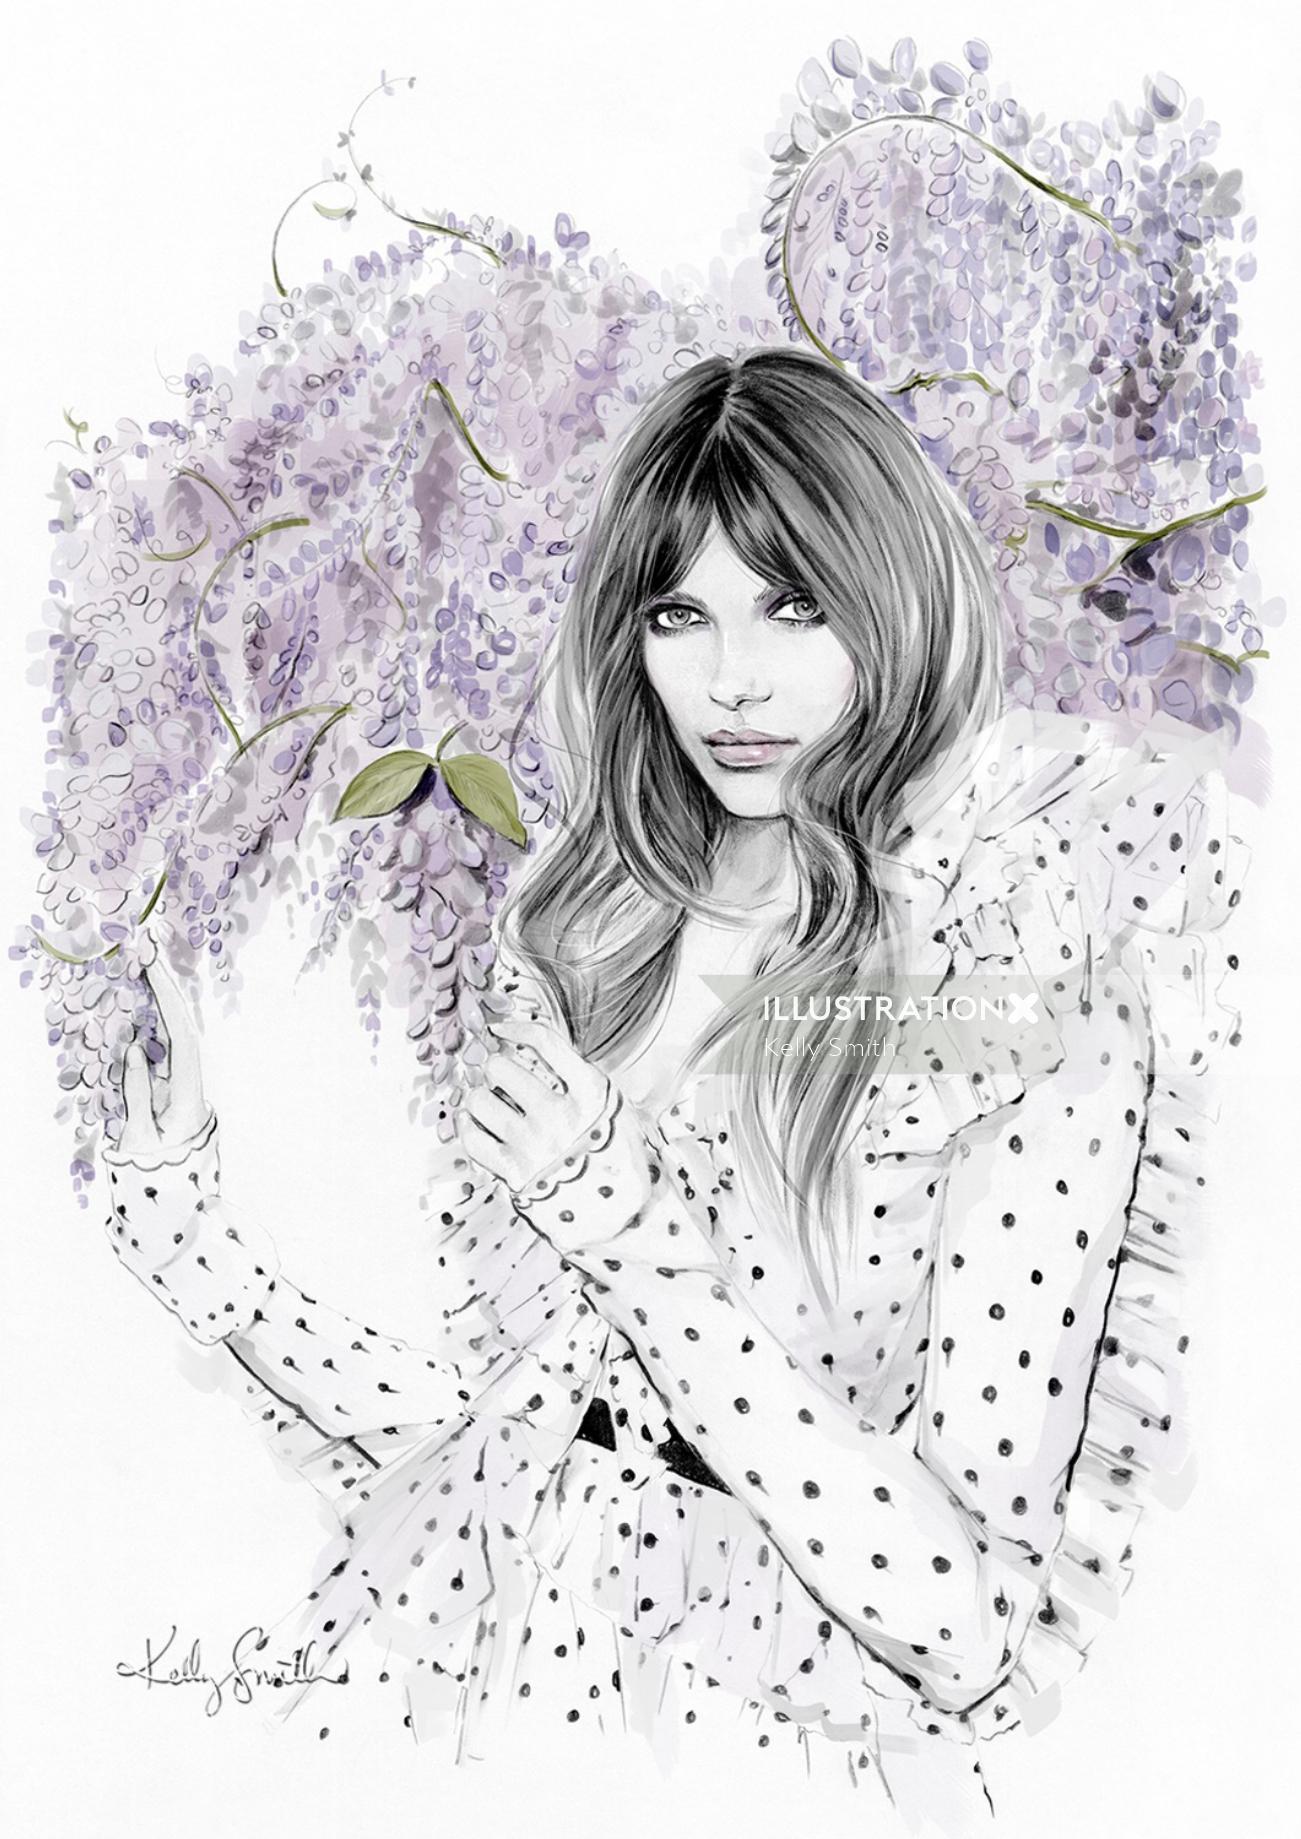 Illustration for The New Trend, Australian fashion retailer